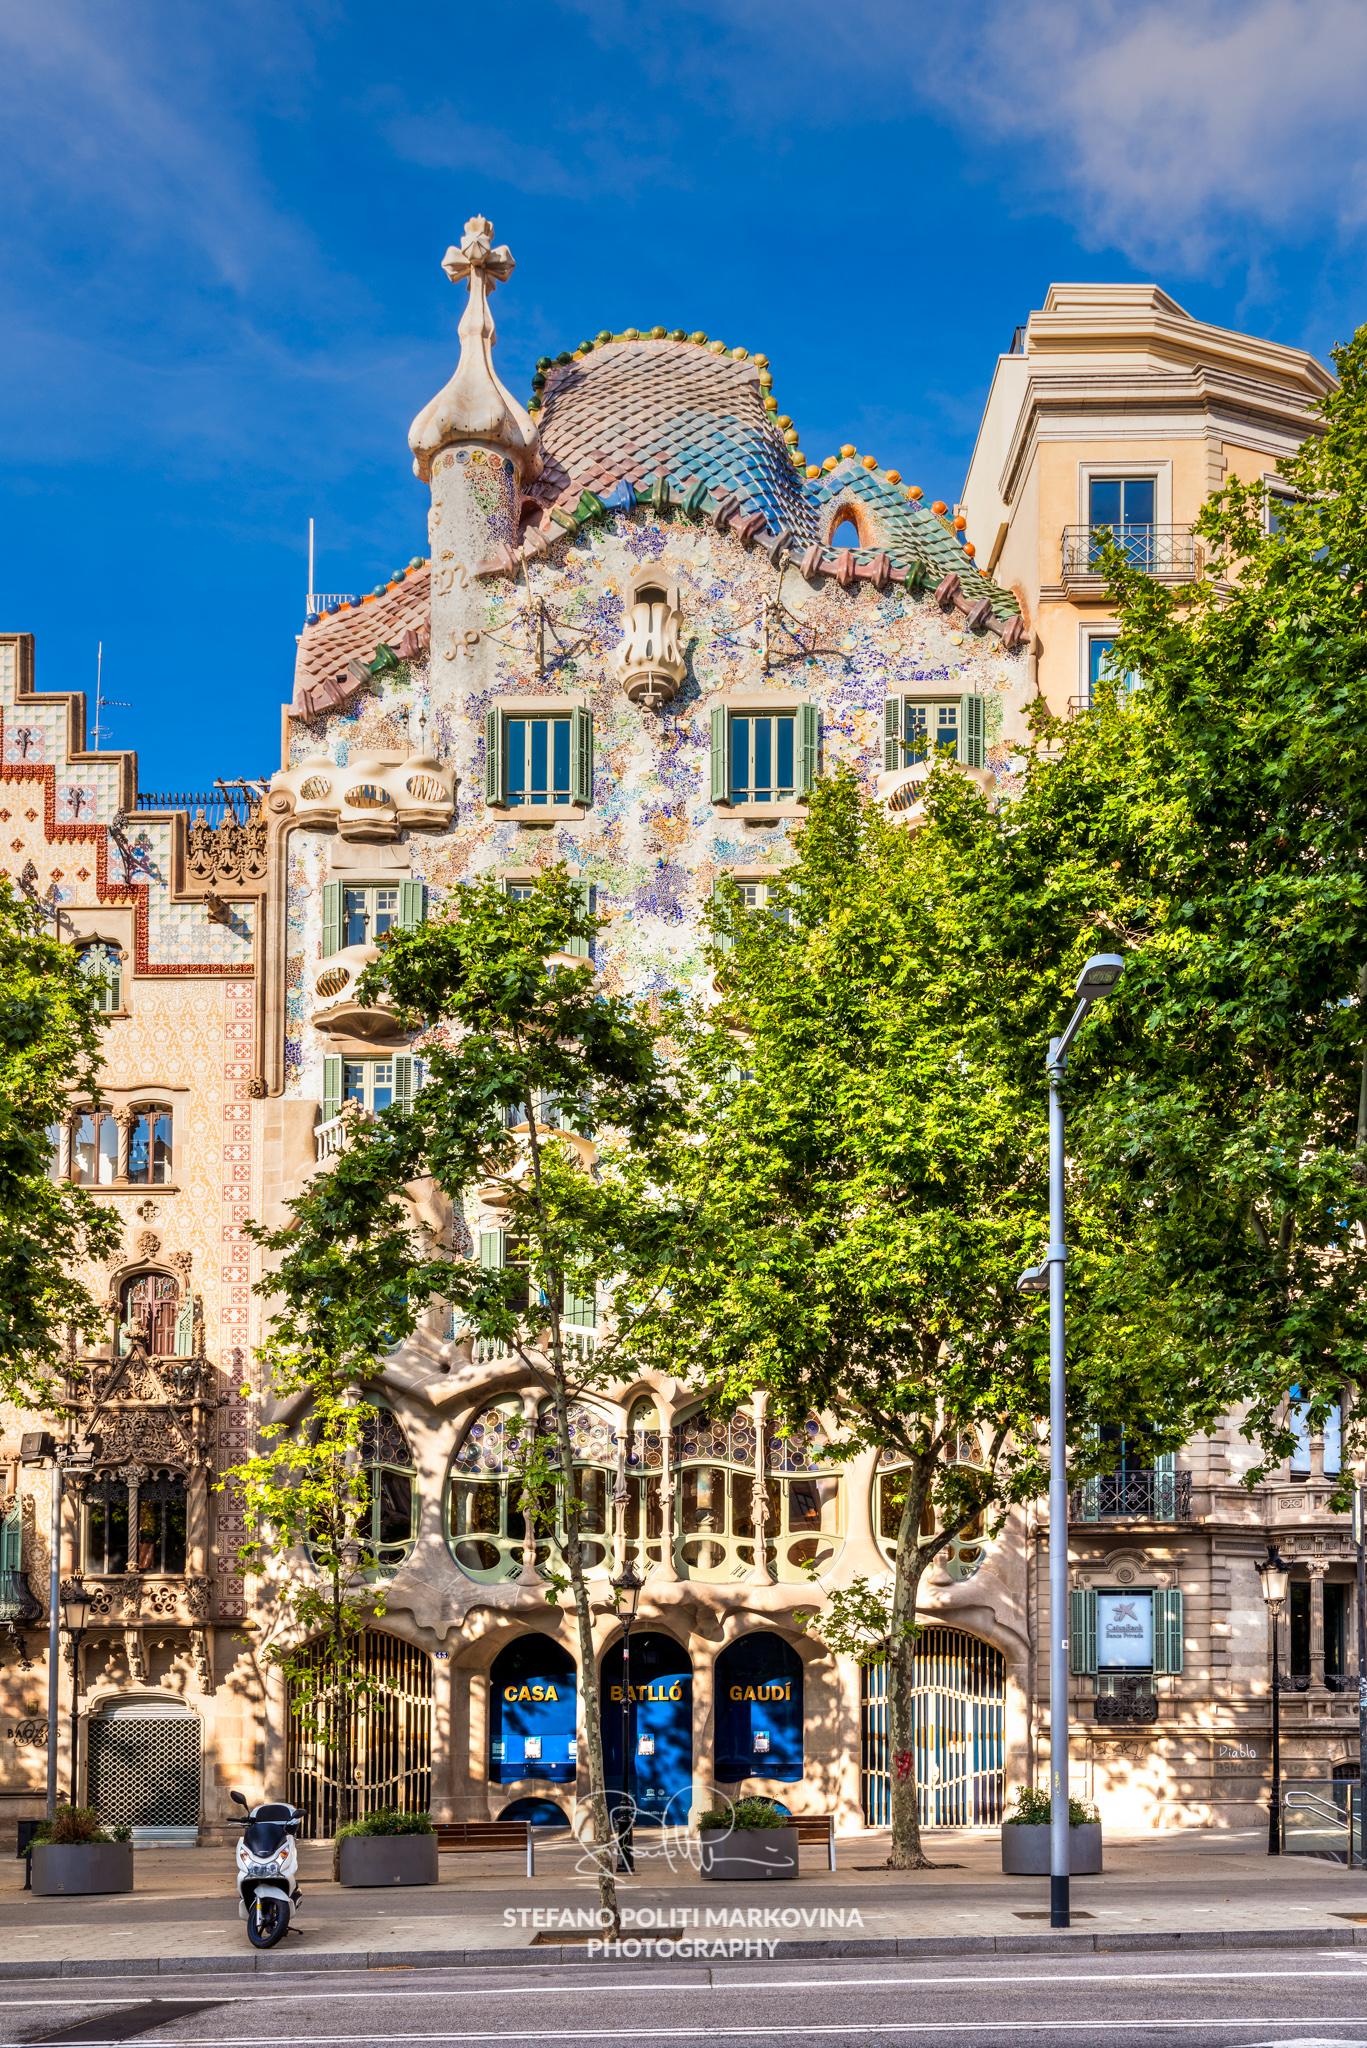 Gaudi's Casa Batllò